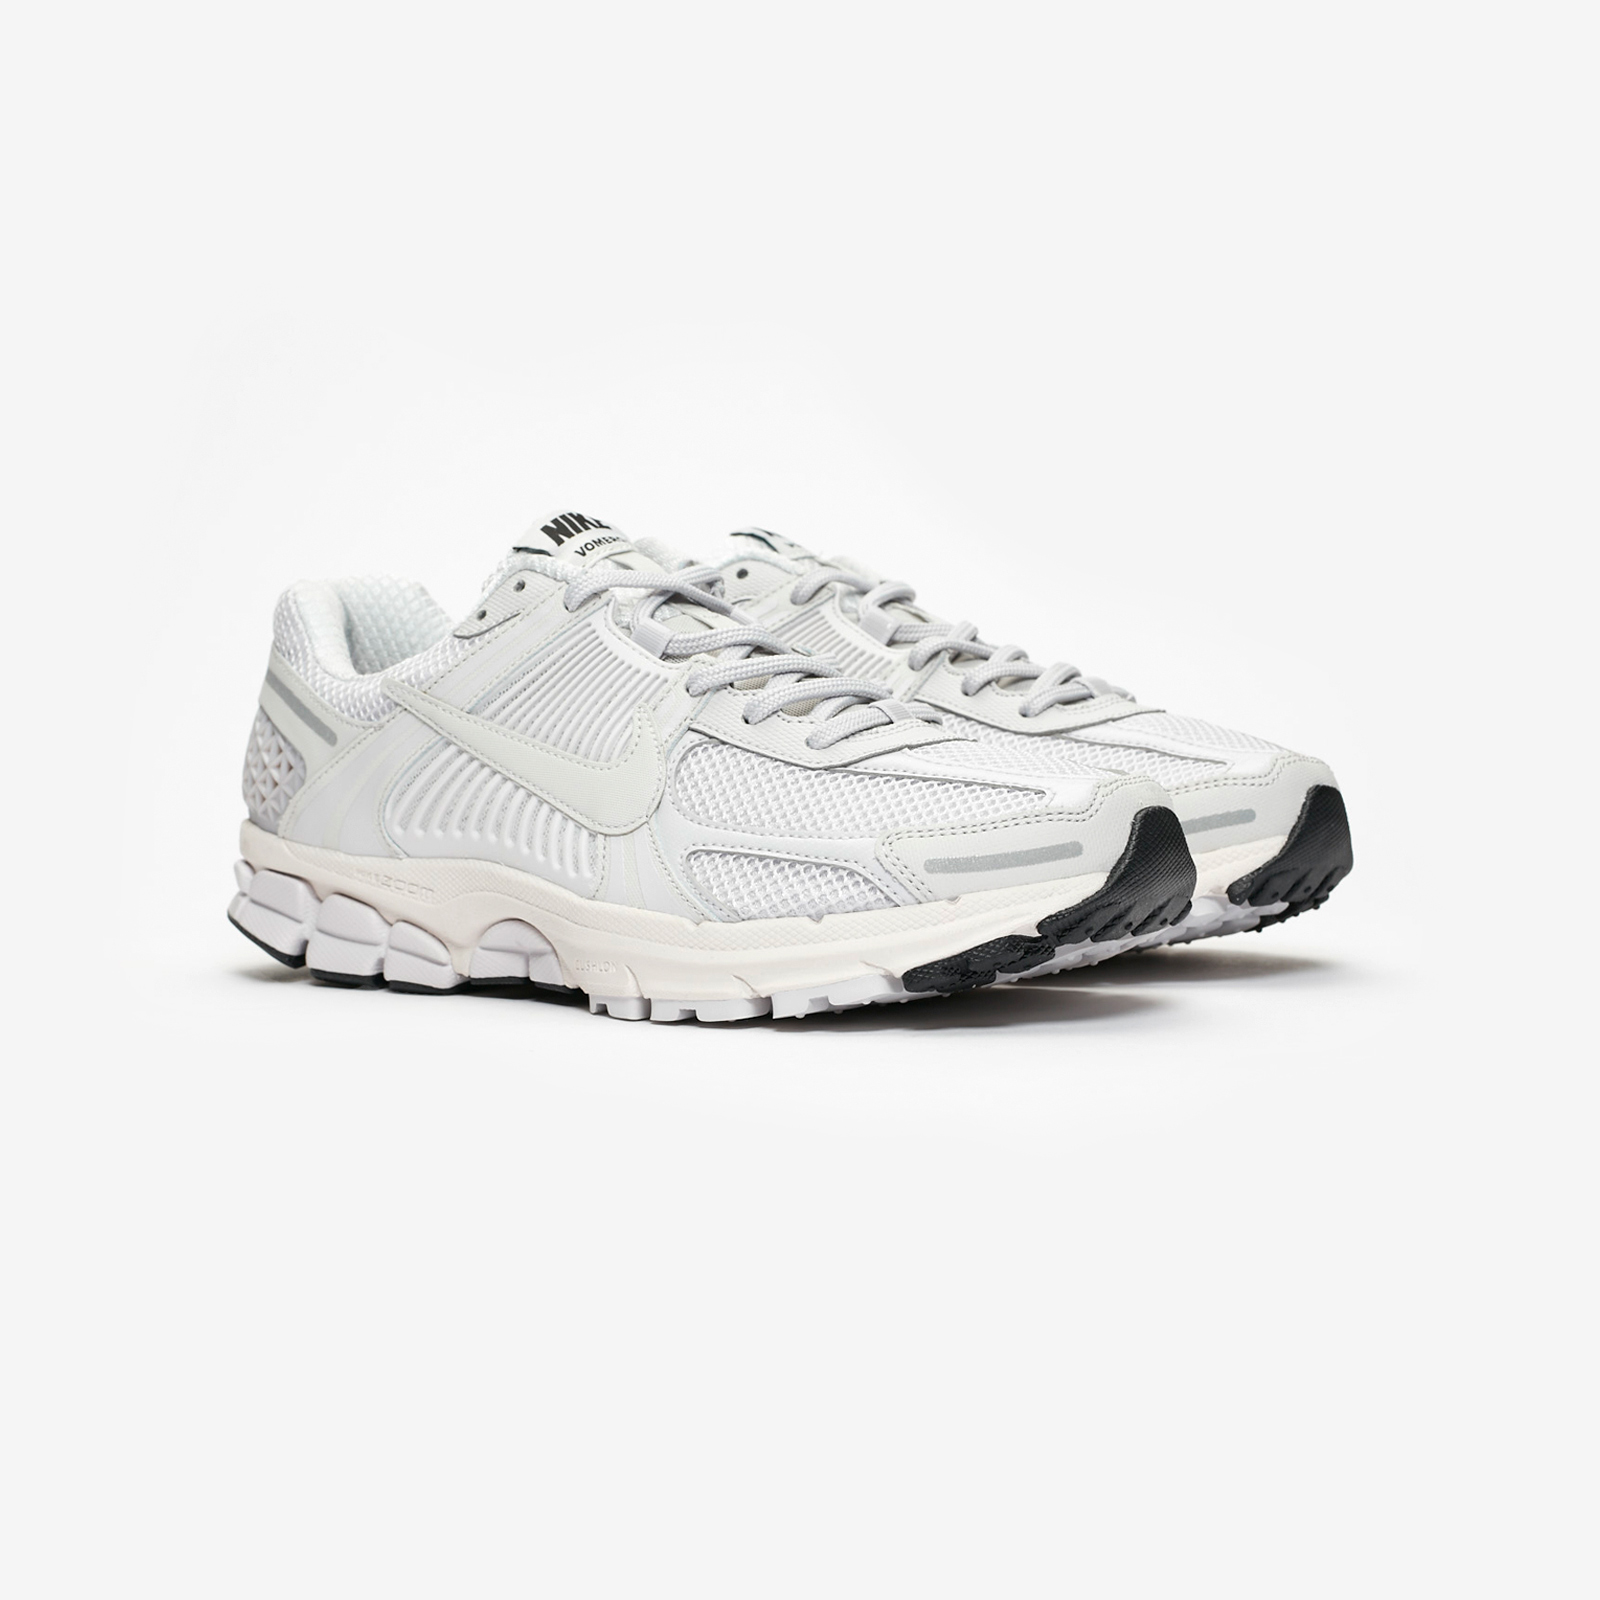 Nike Zoom Vomero 5 SP - Bv1358-001